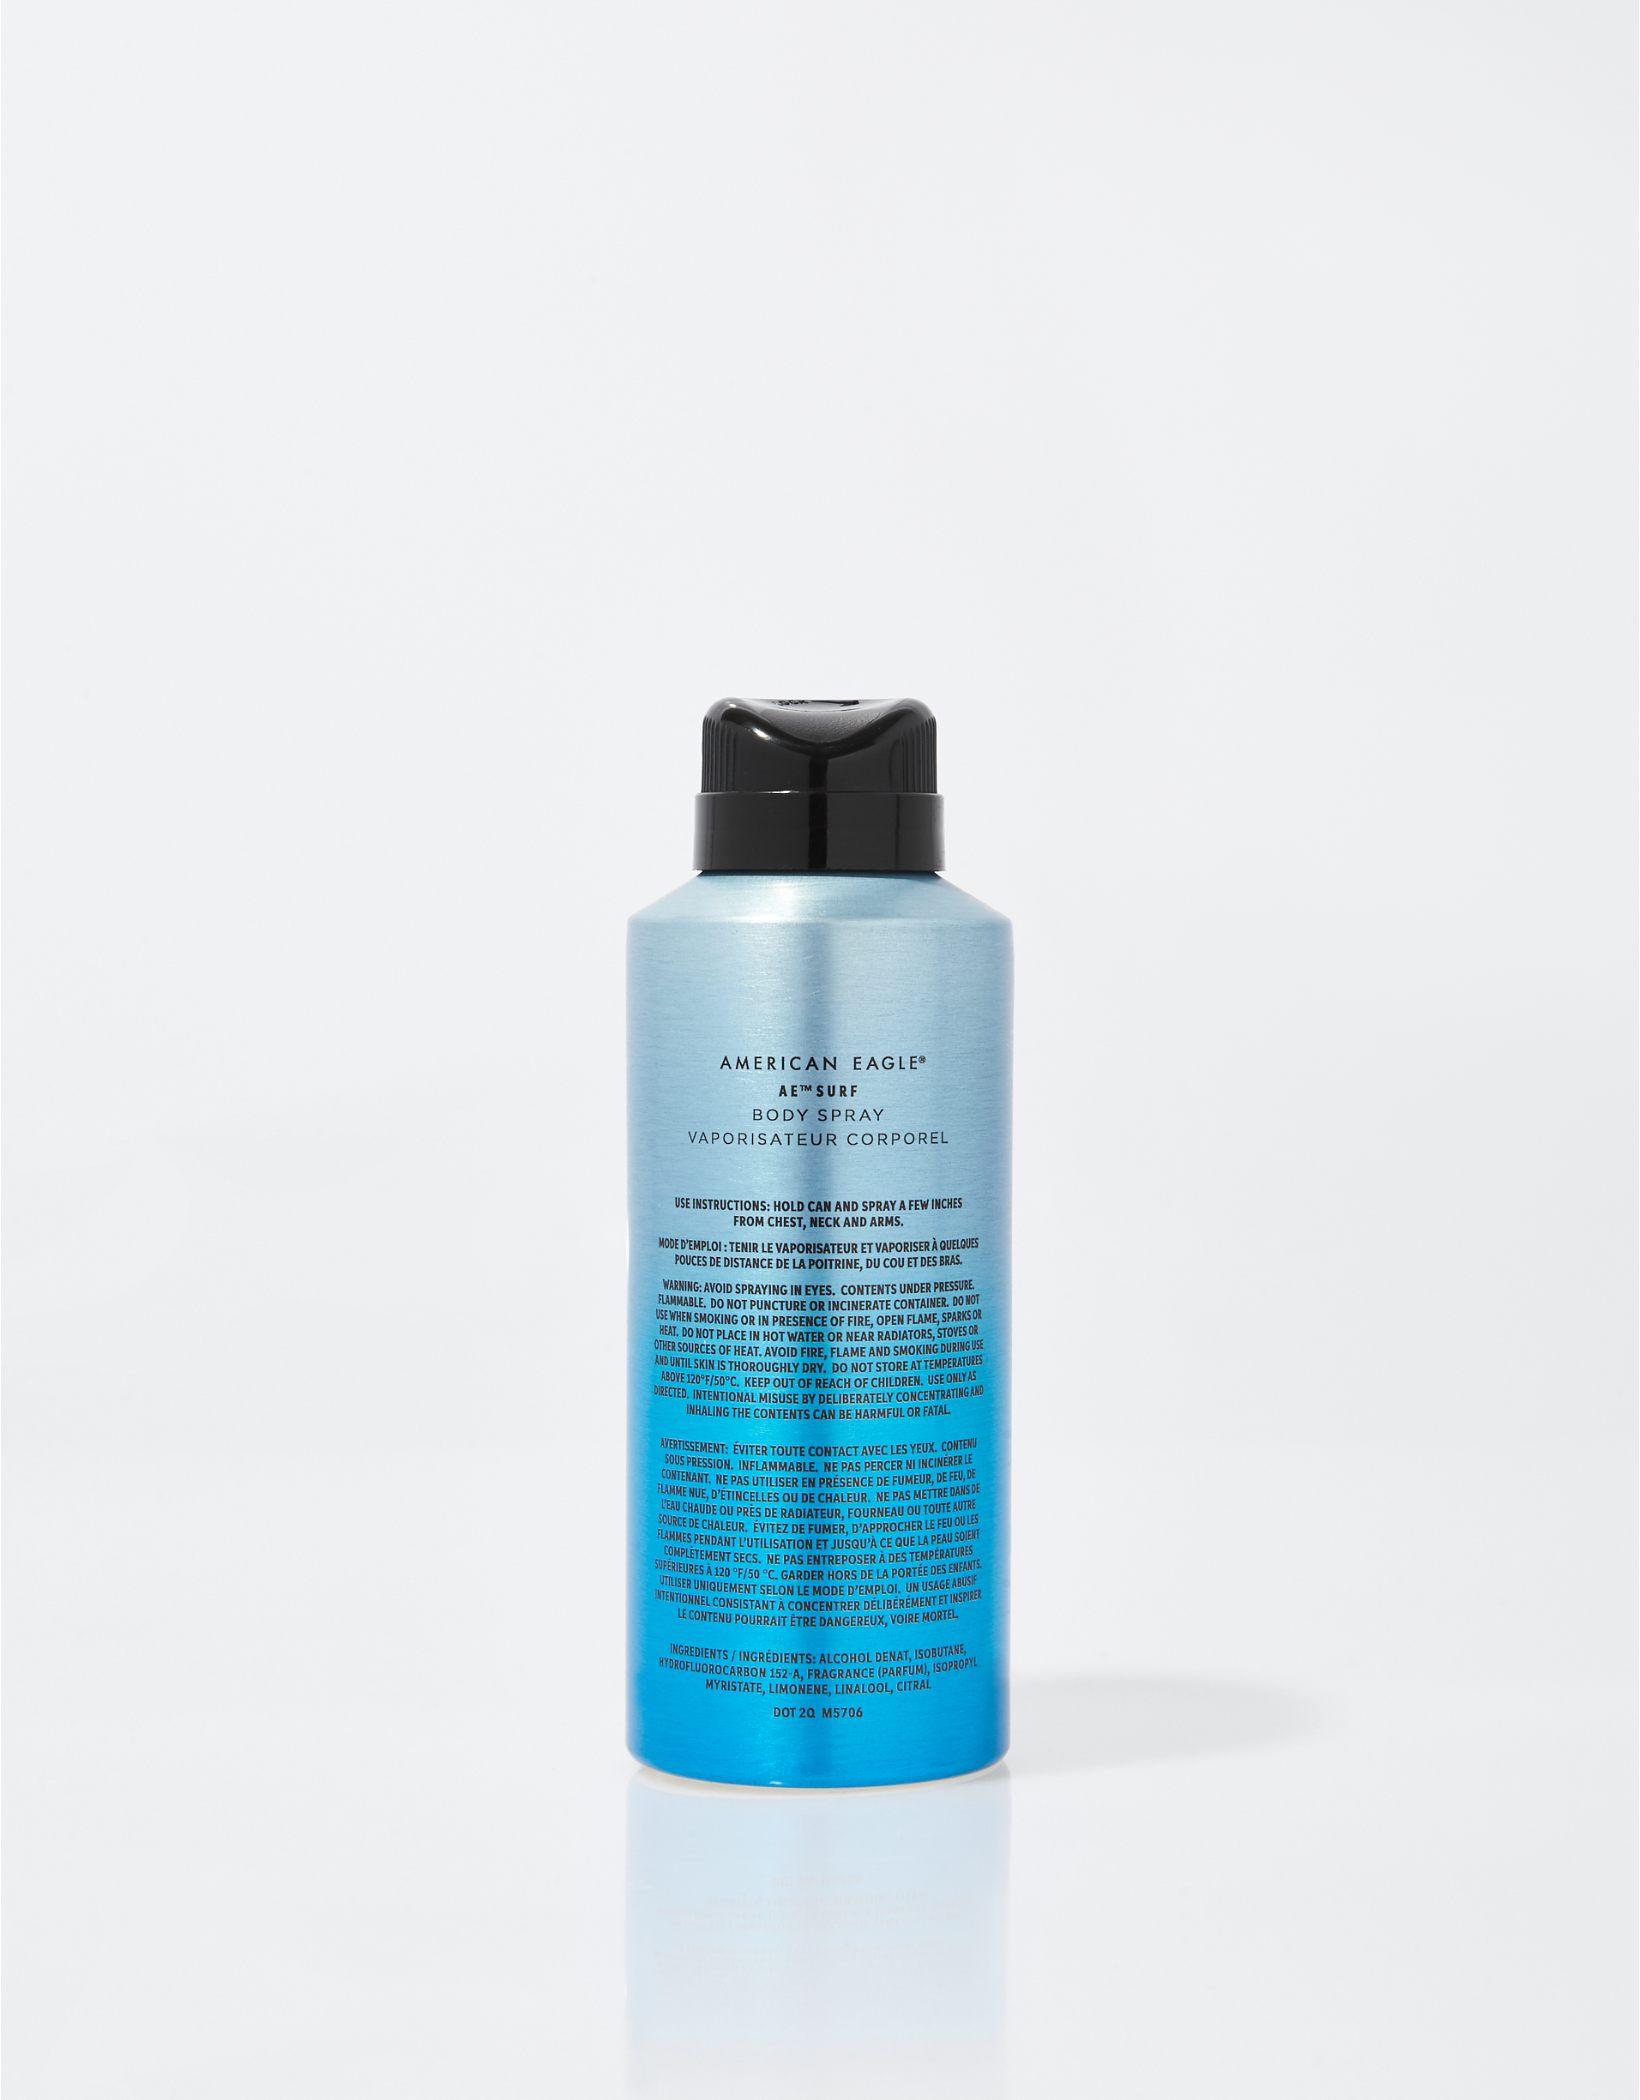 AEO Surf 4.5oz Body Spray